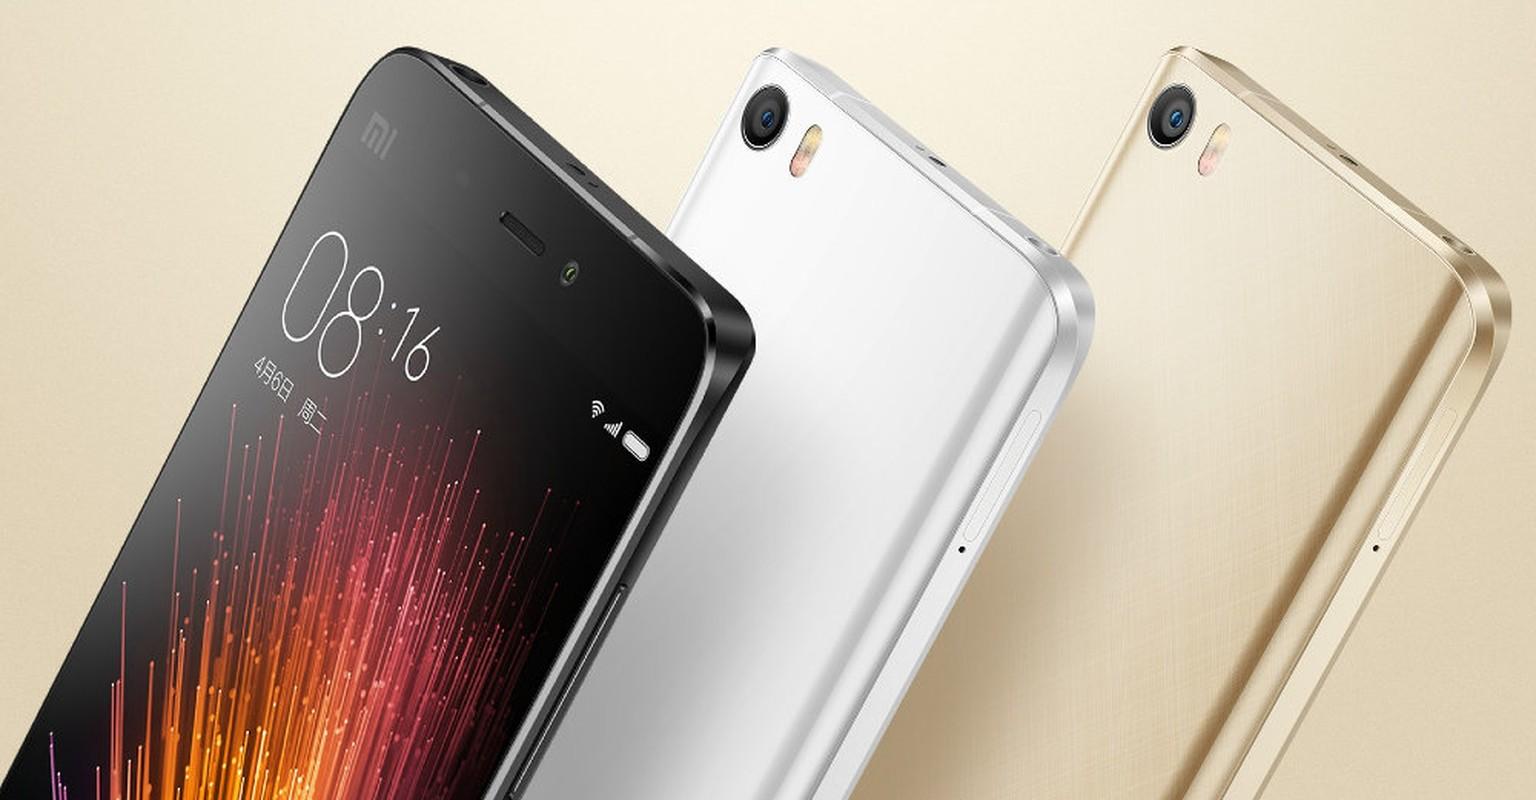 Ngam dien thoai Xiaomi Mi 5 vua chinh thuc trinh lang-Hinh-2